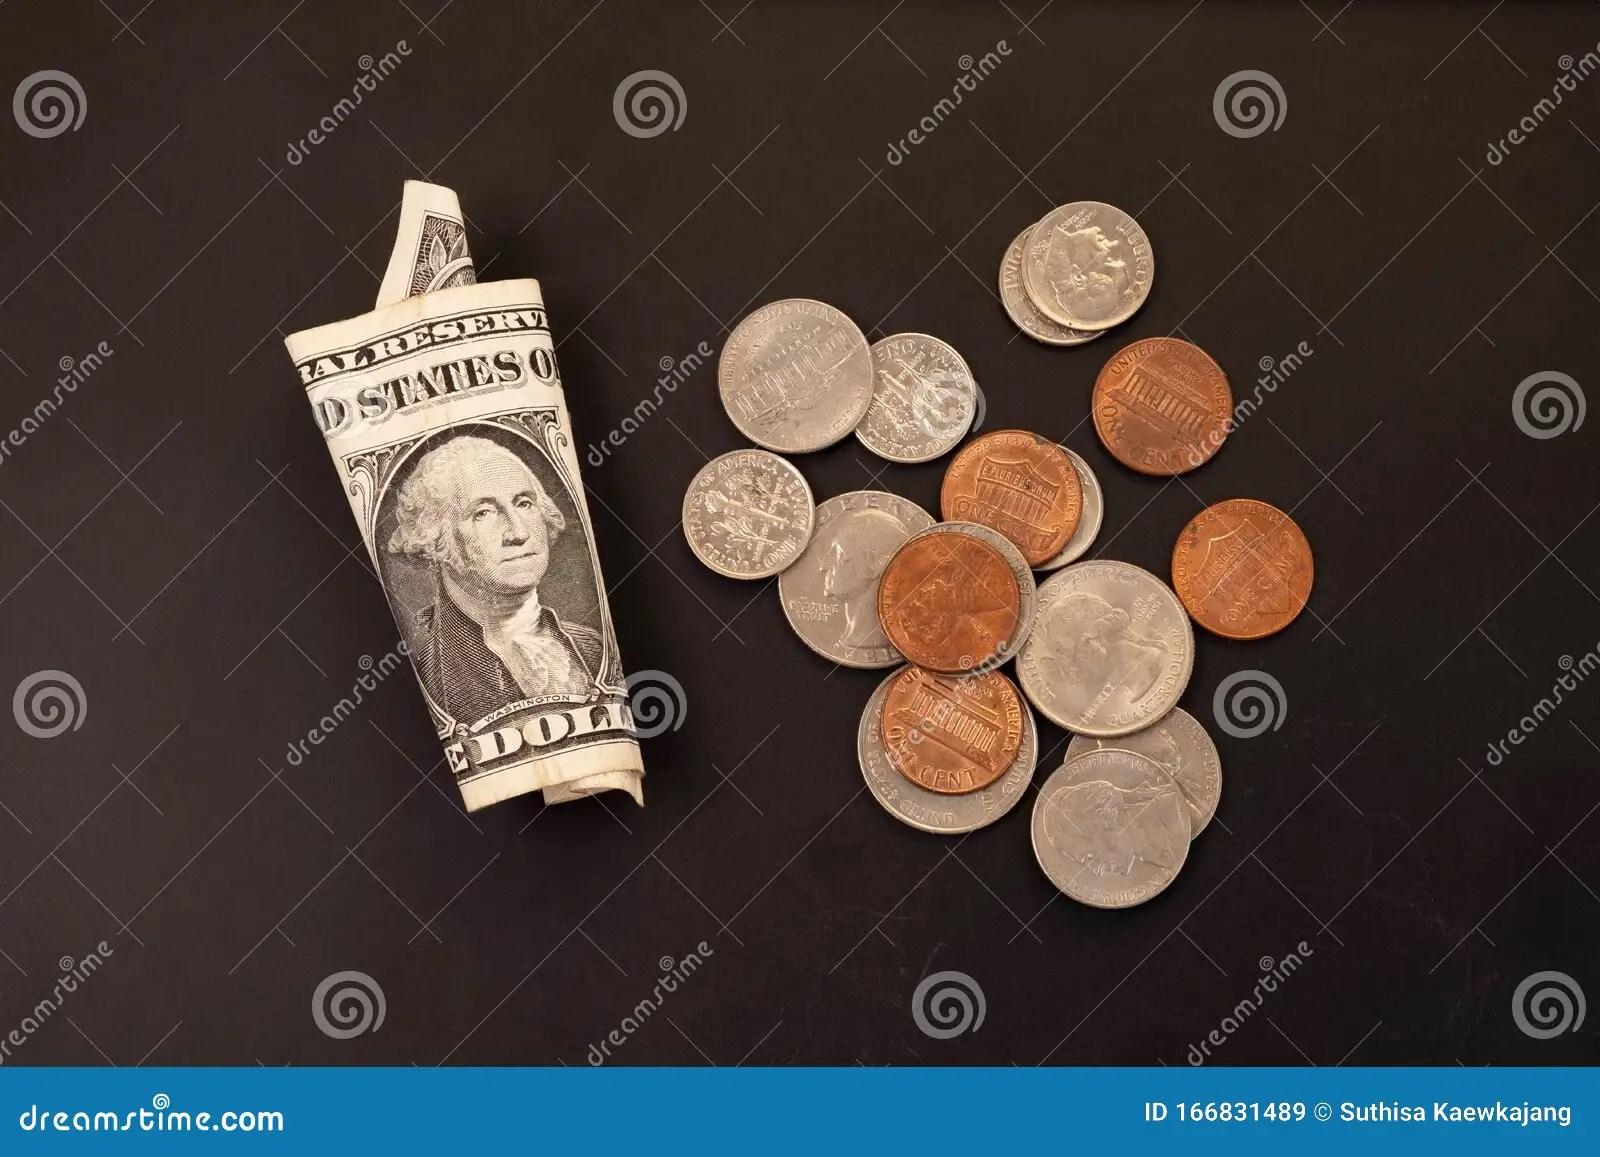 Penny Nickel Dime Quarter Stock Photos